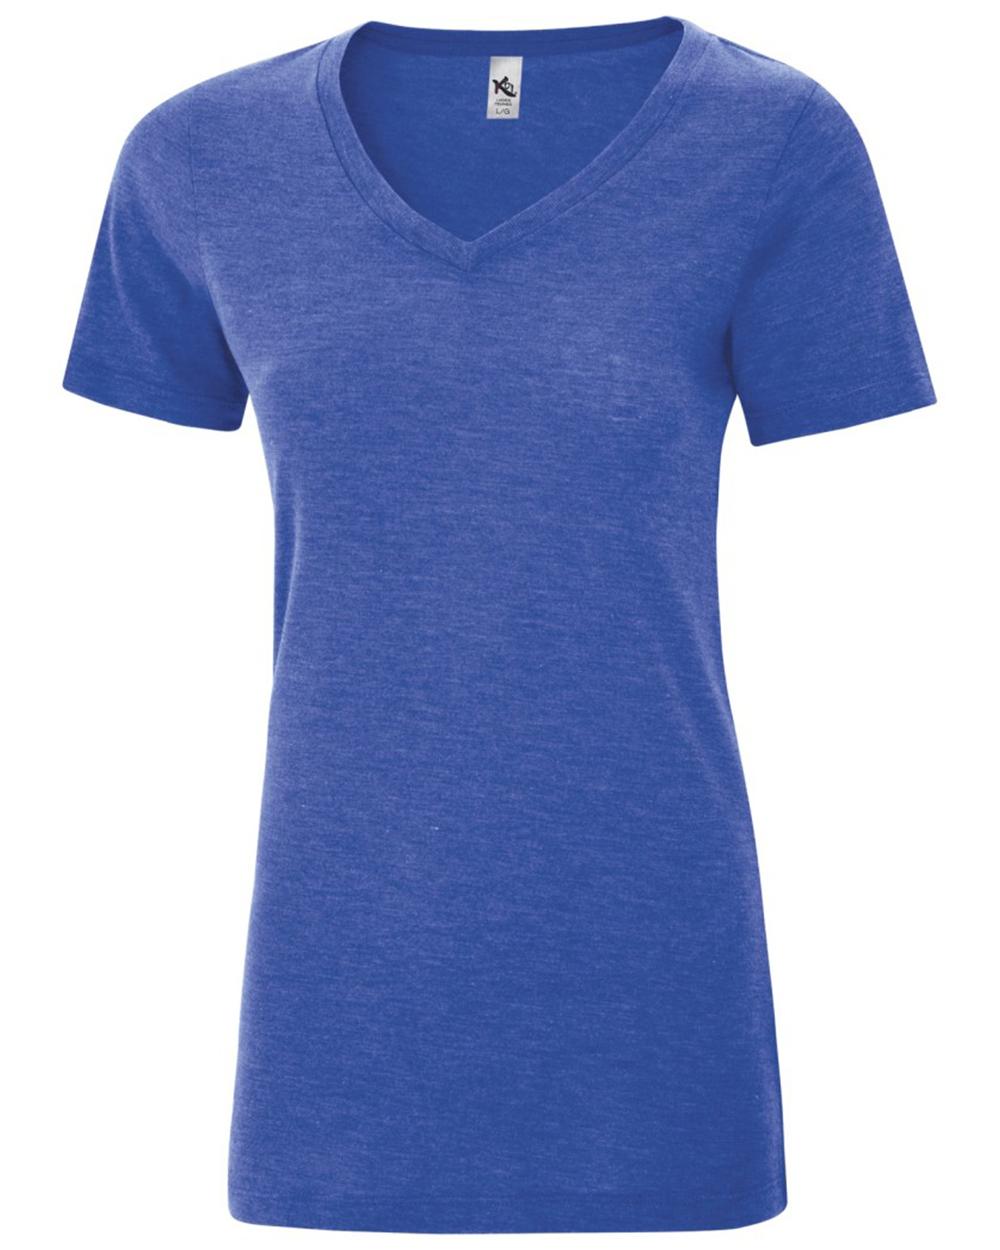 Triblend V-neck Ladies' T-Shirt